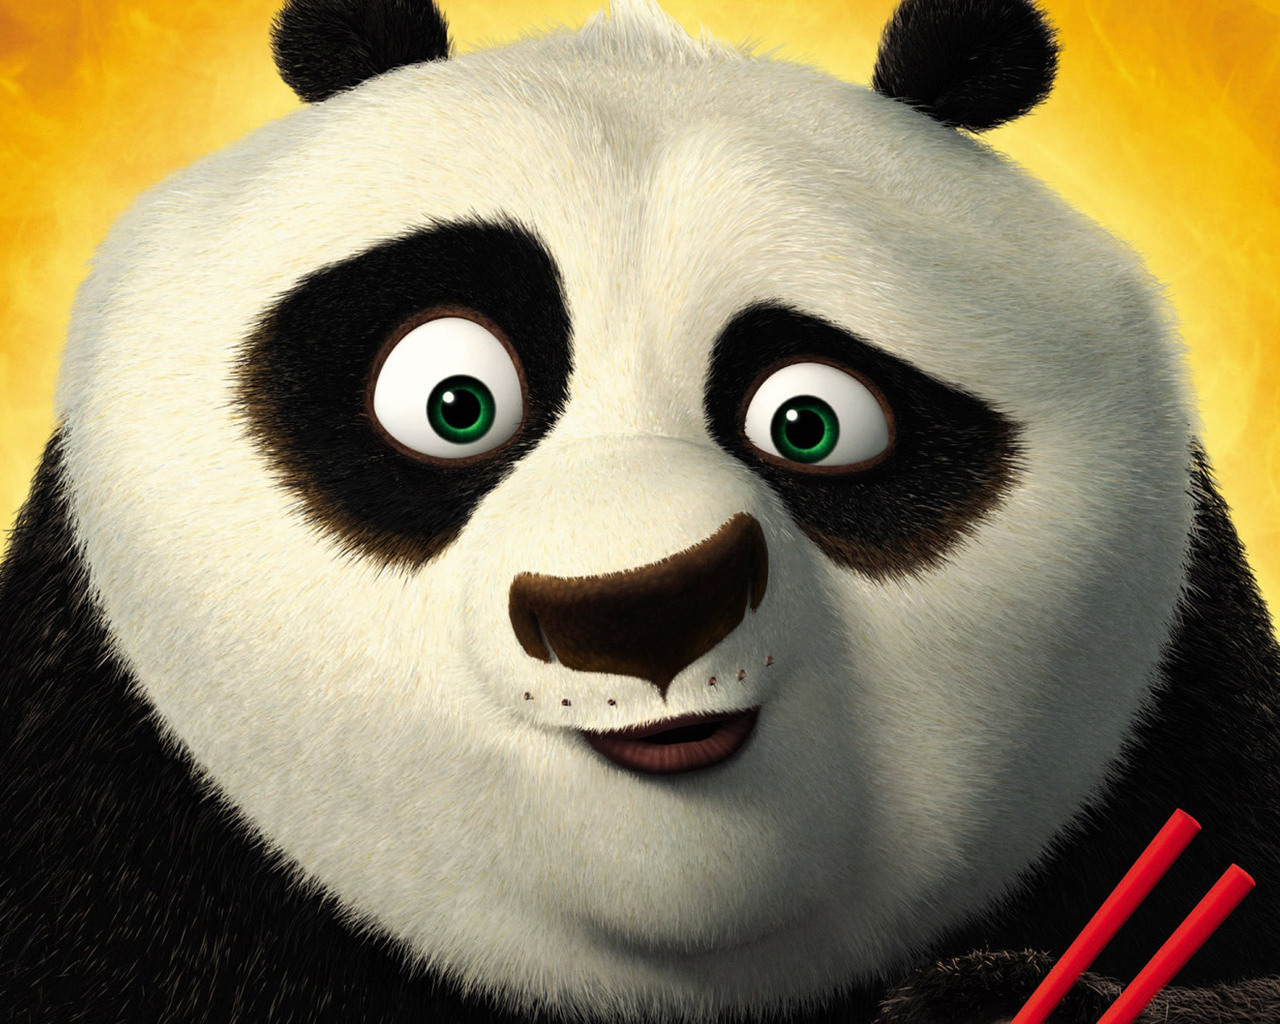 Мультфильм кунг фу панда 2 картинки